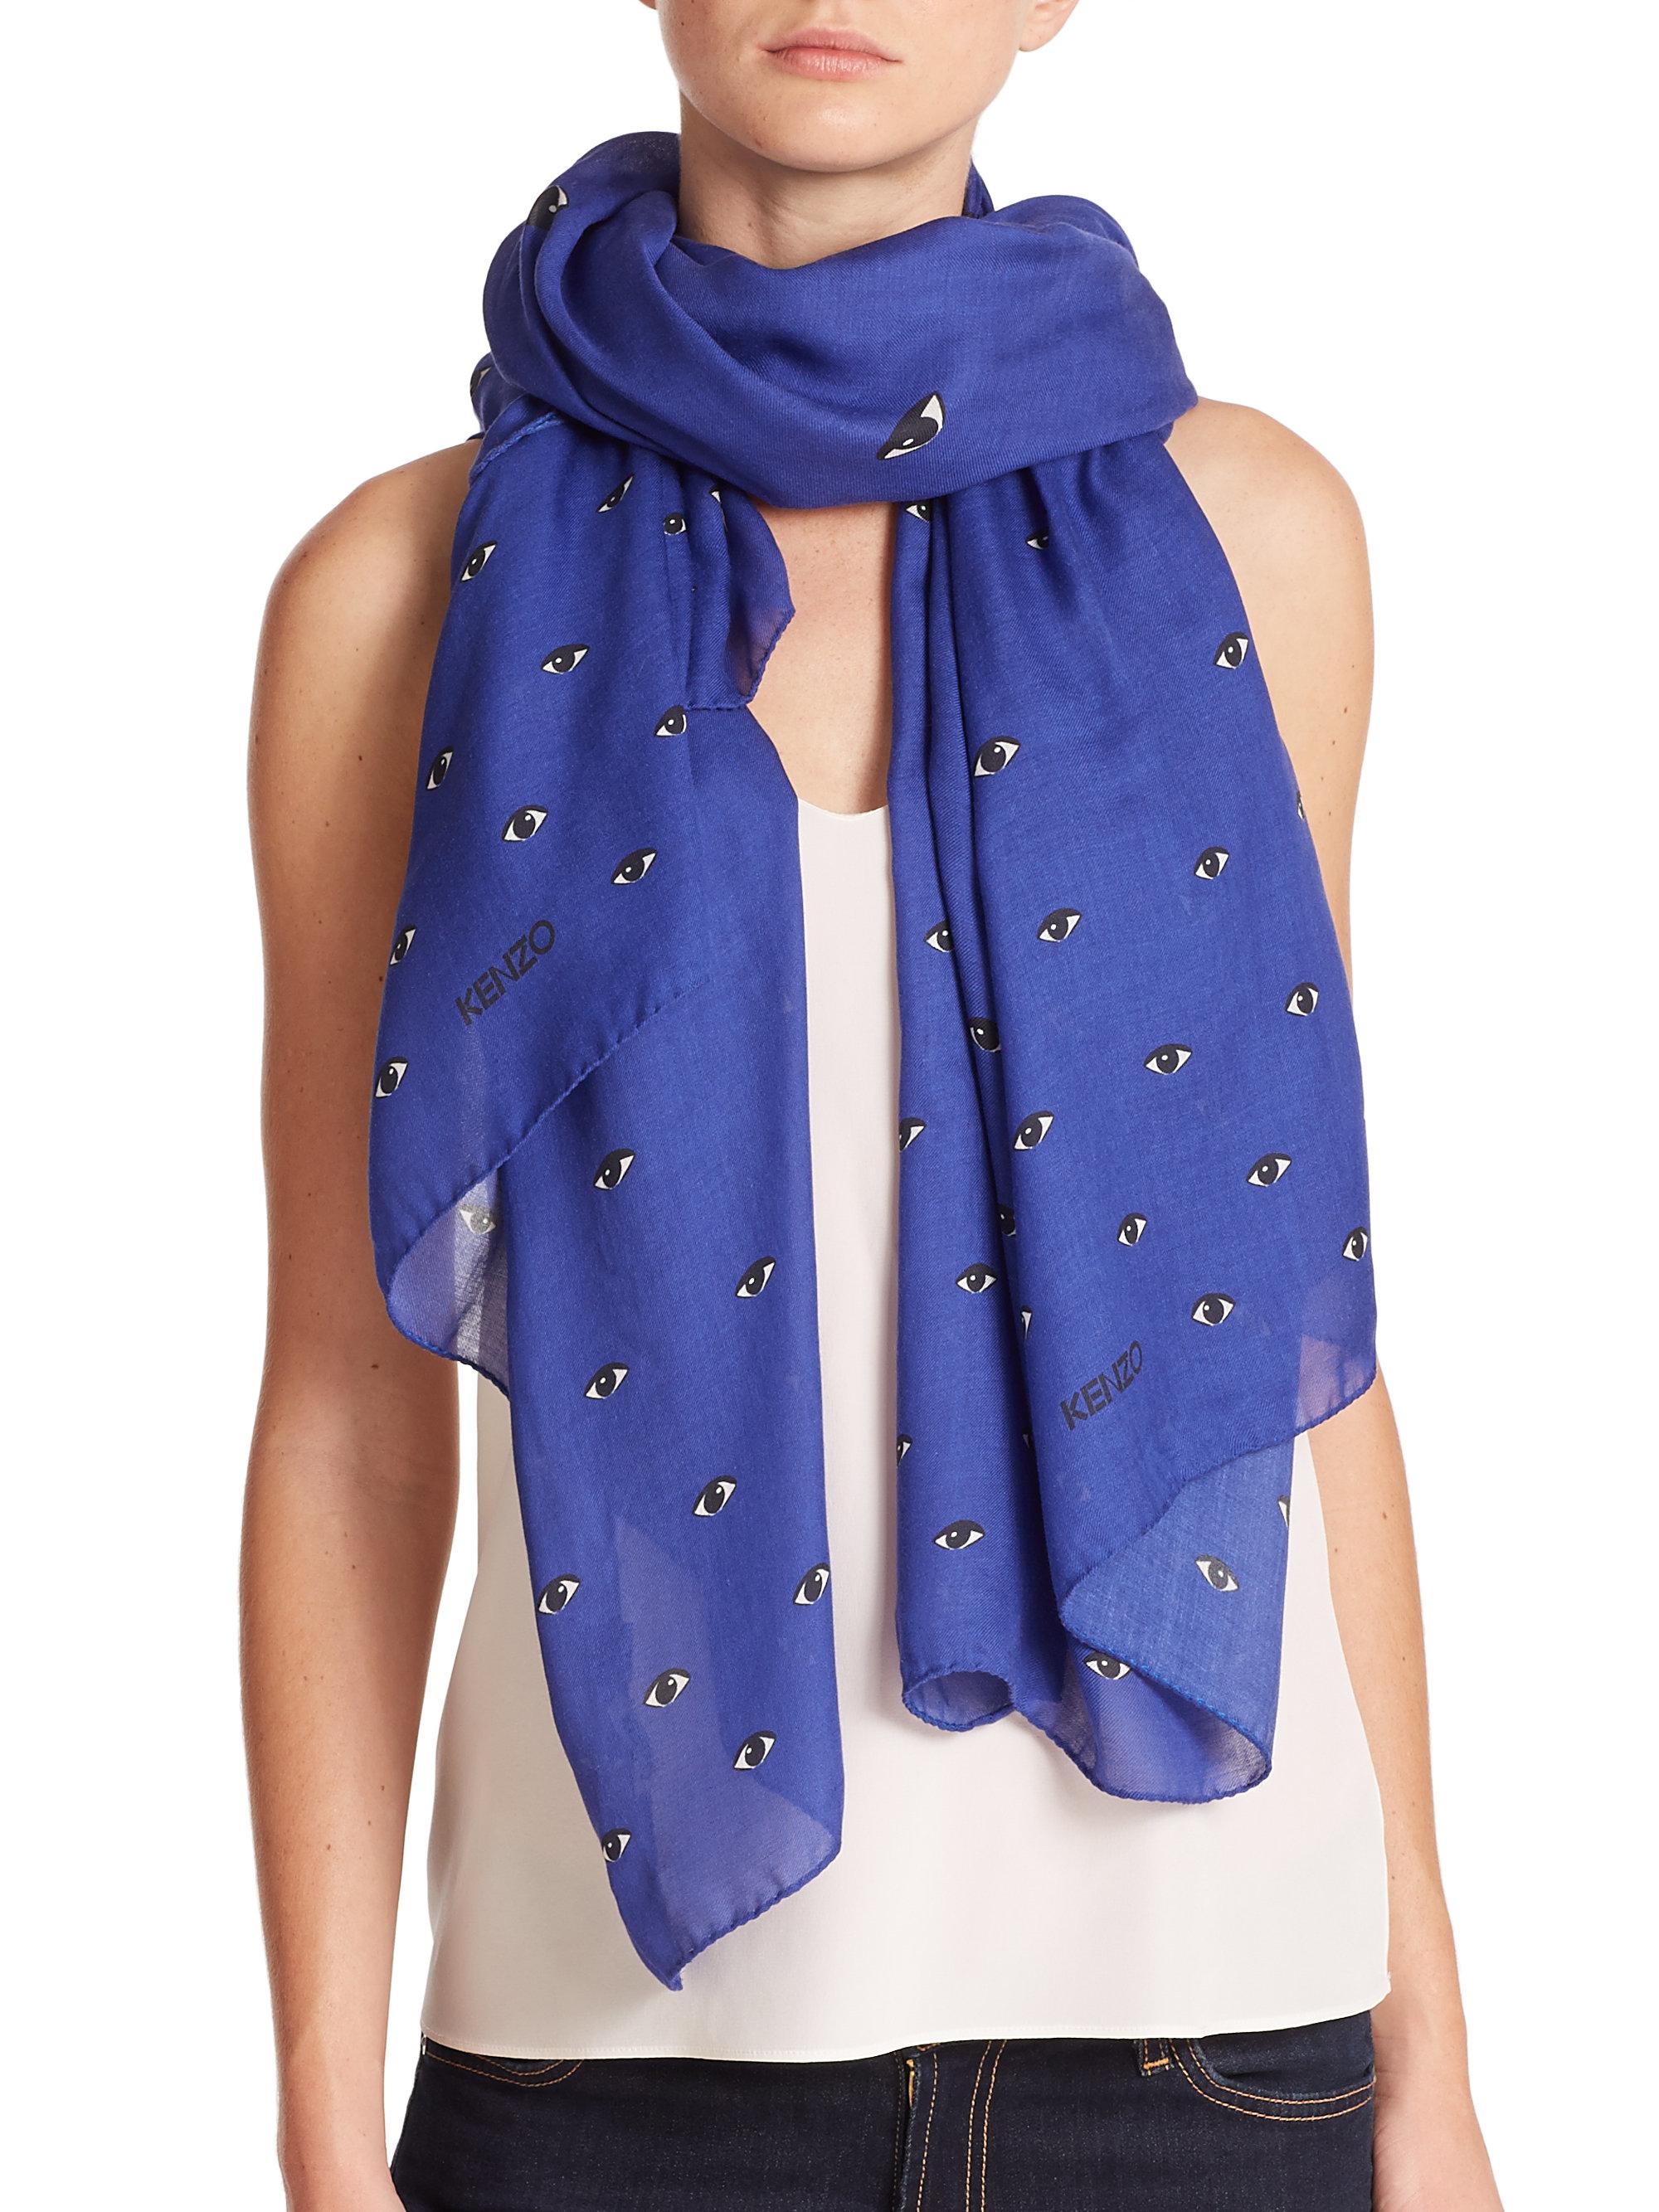 paisley ferrari brown lyst glick accessories dark franco scarf in gallery